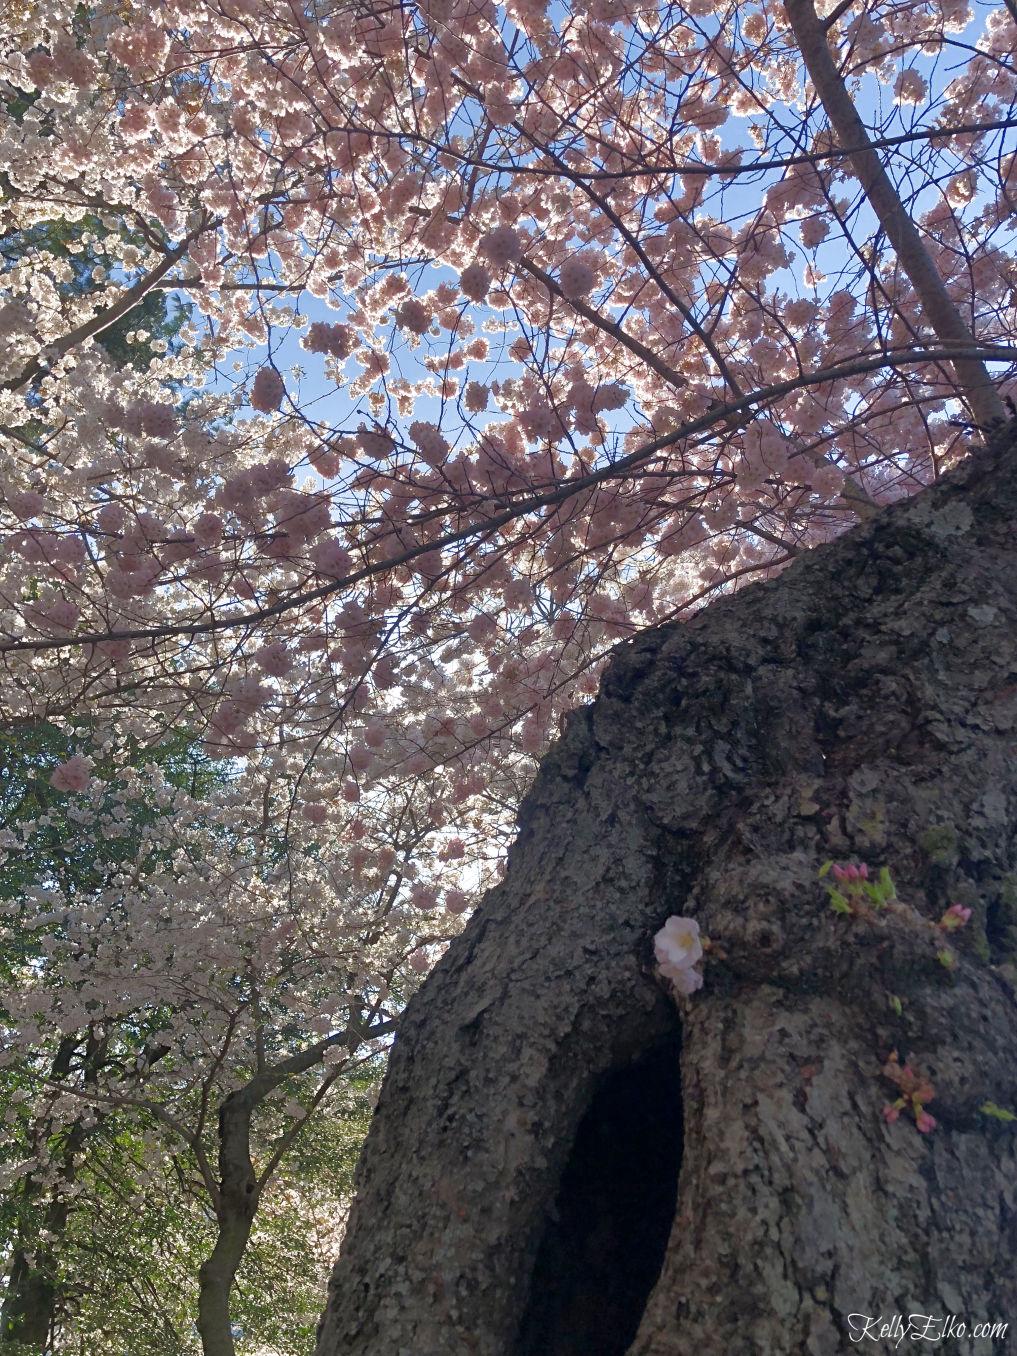 Cherry Blossoms in Washington, DC kellyelko.com #cherryblossoms #travel #travelblog #vacation